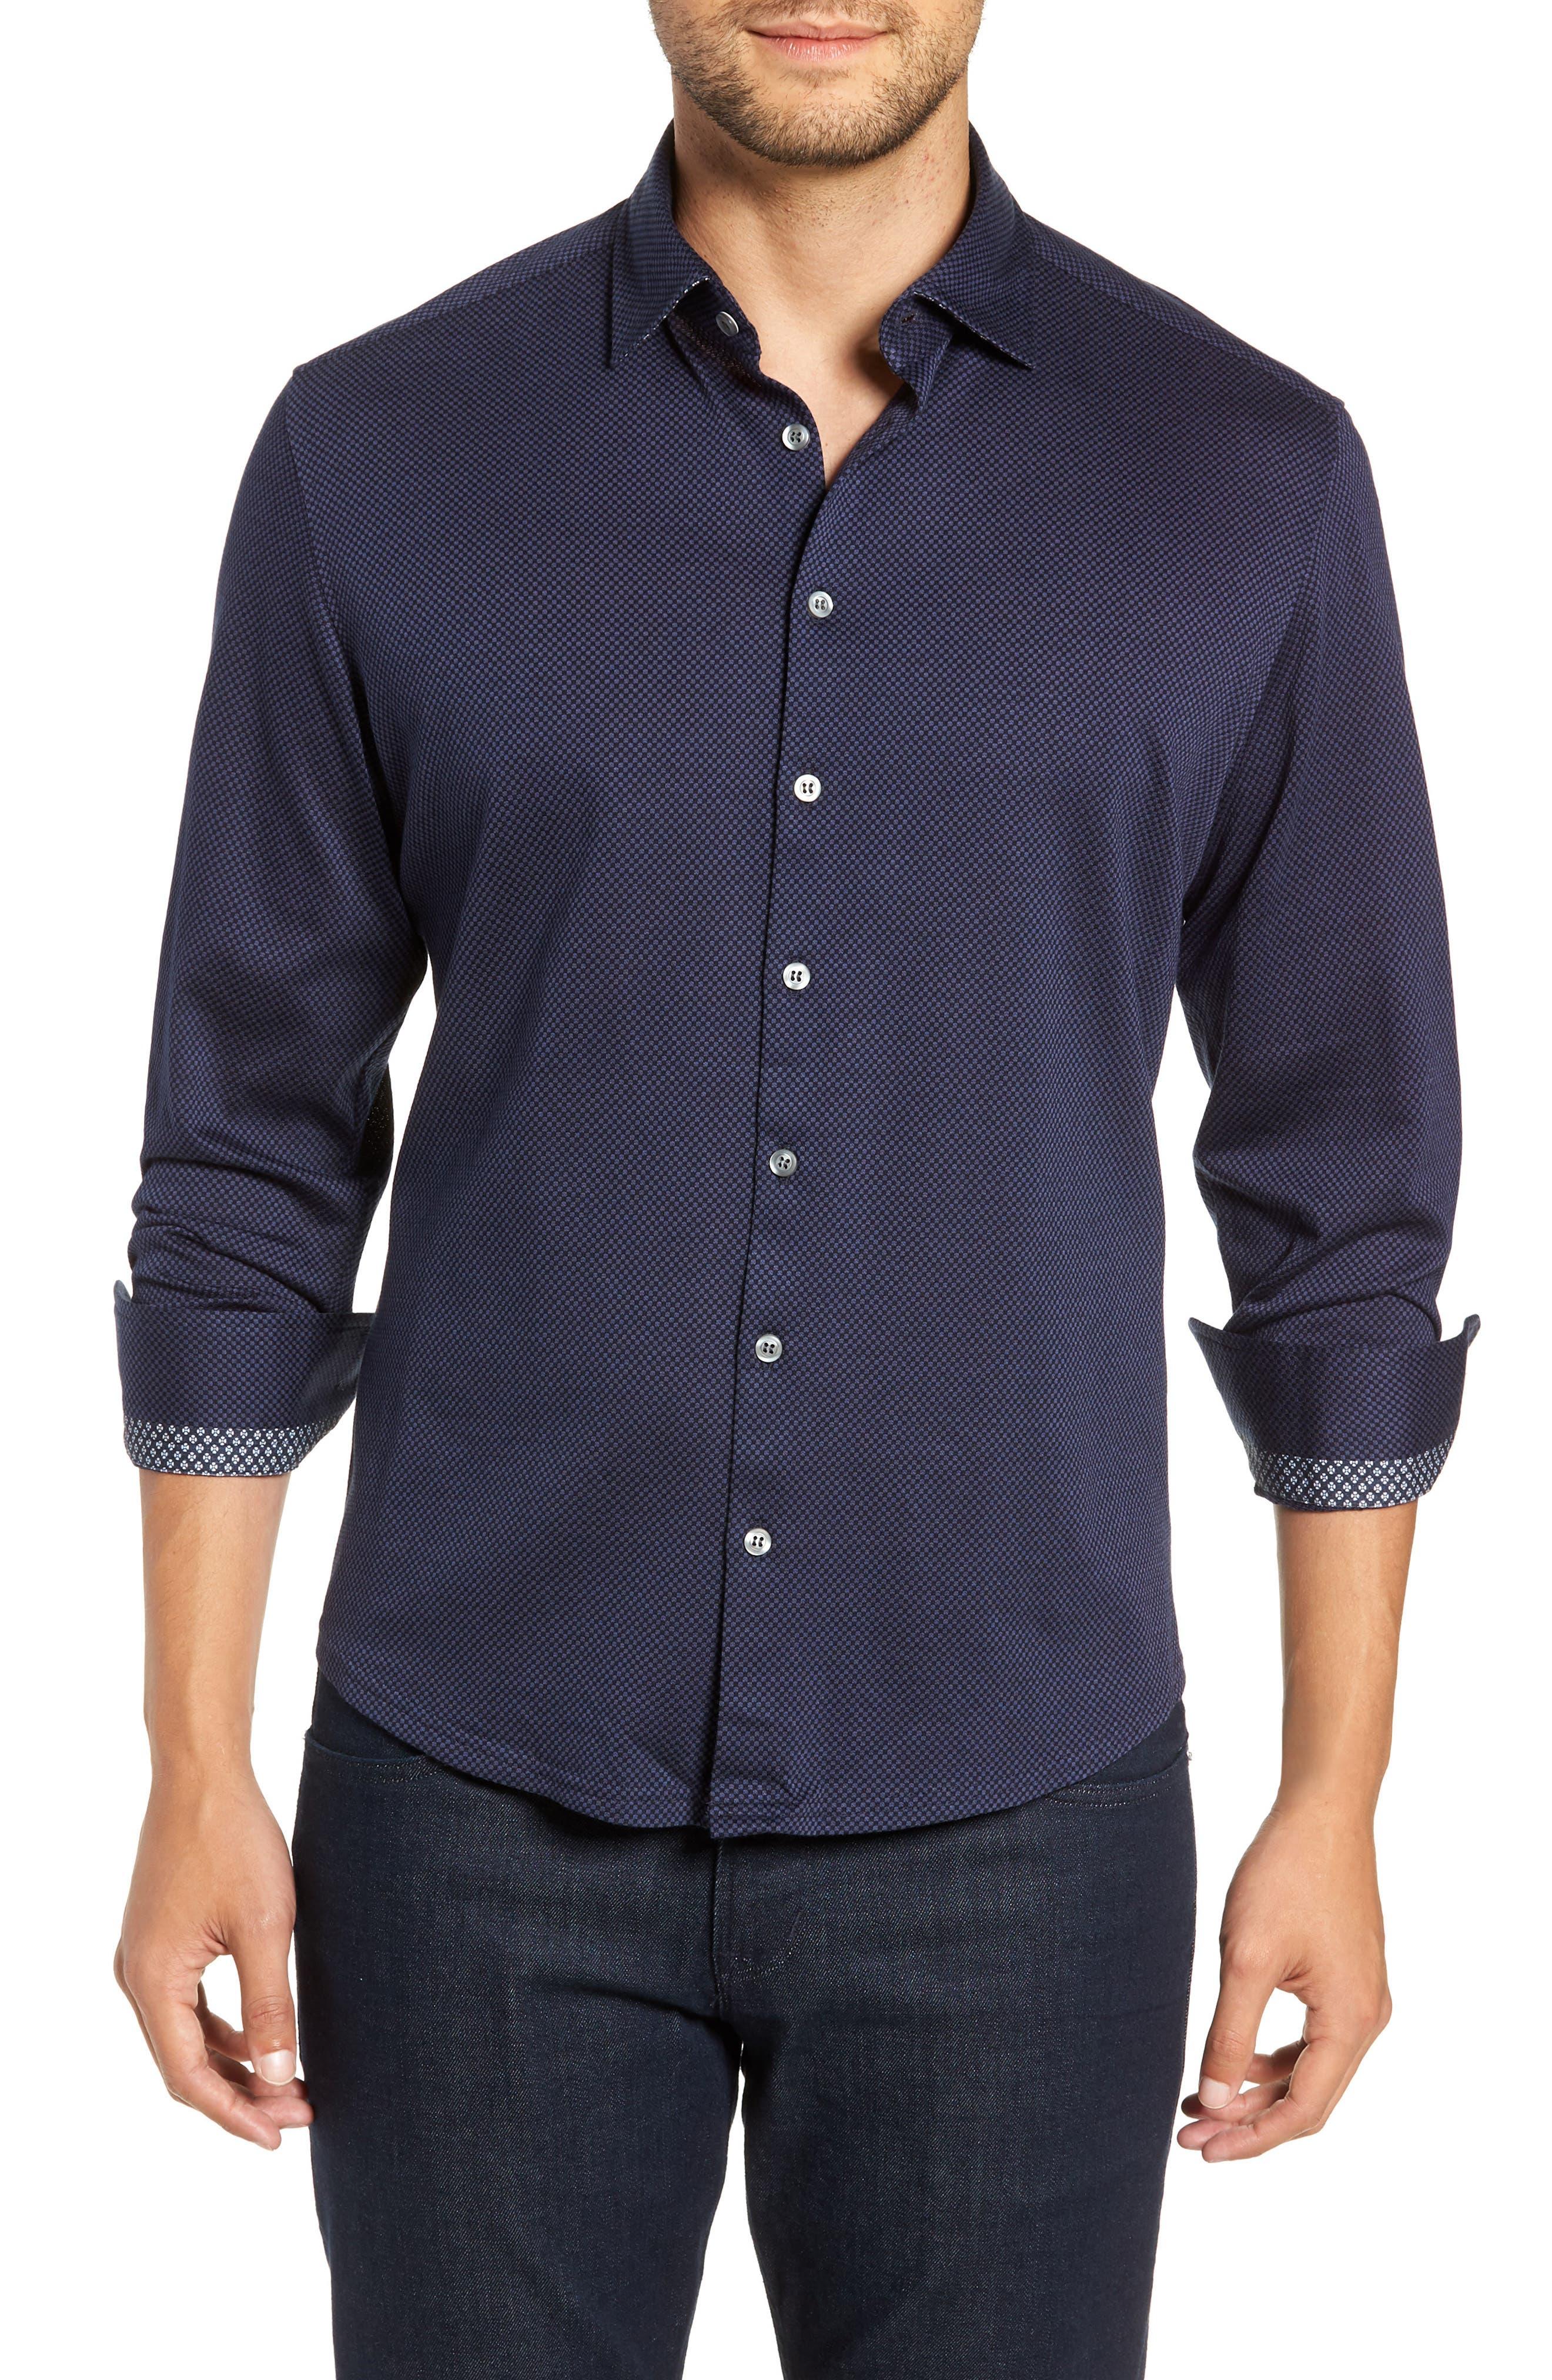 STONE ROSE Trim Fit Knit Sport Shirt, Main, color, 410